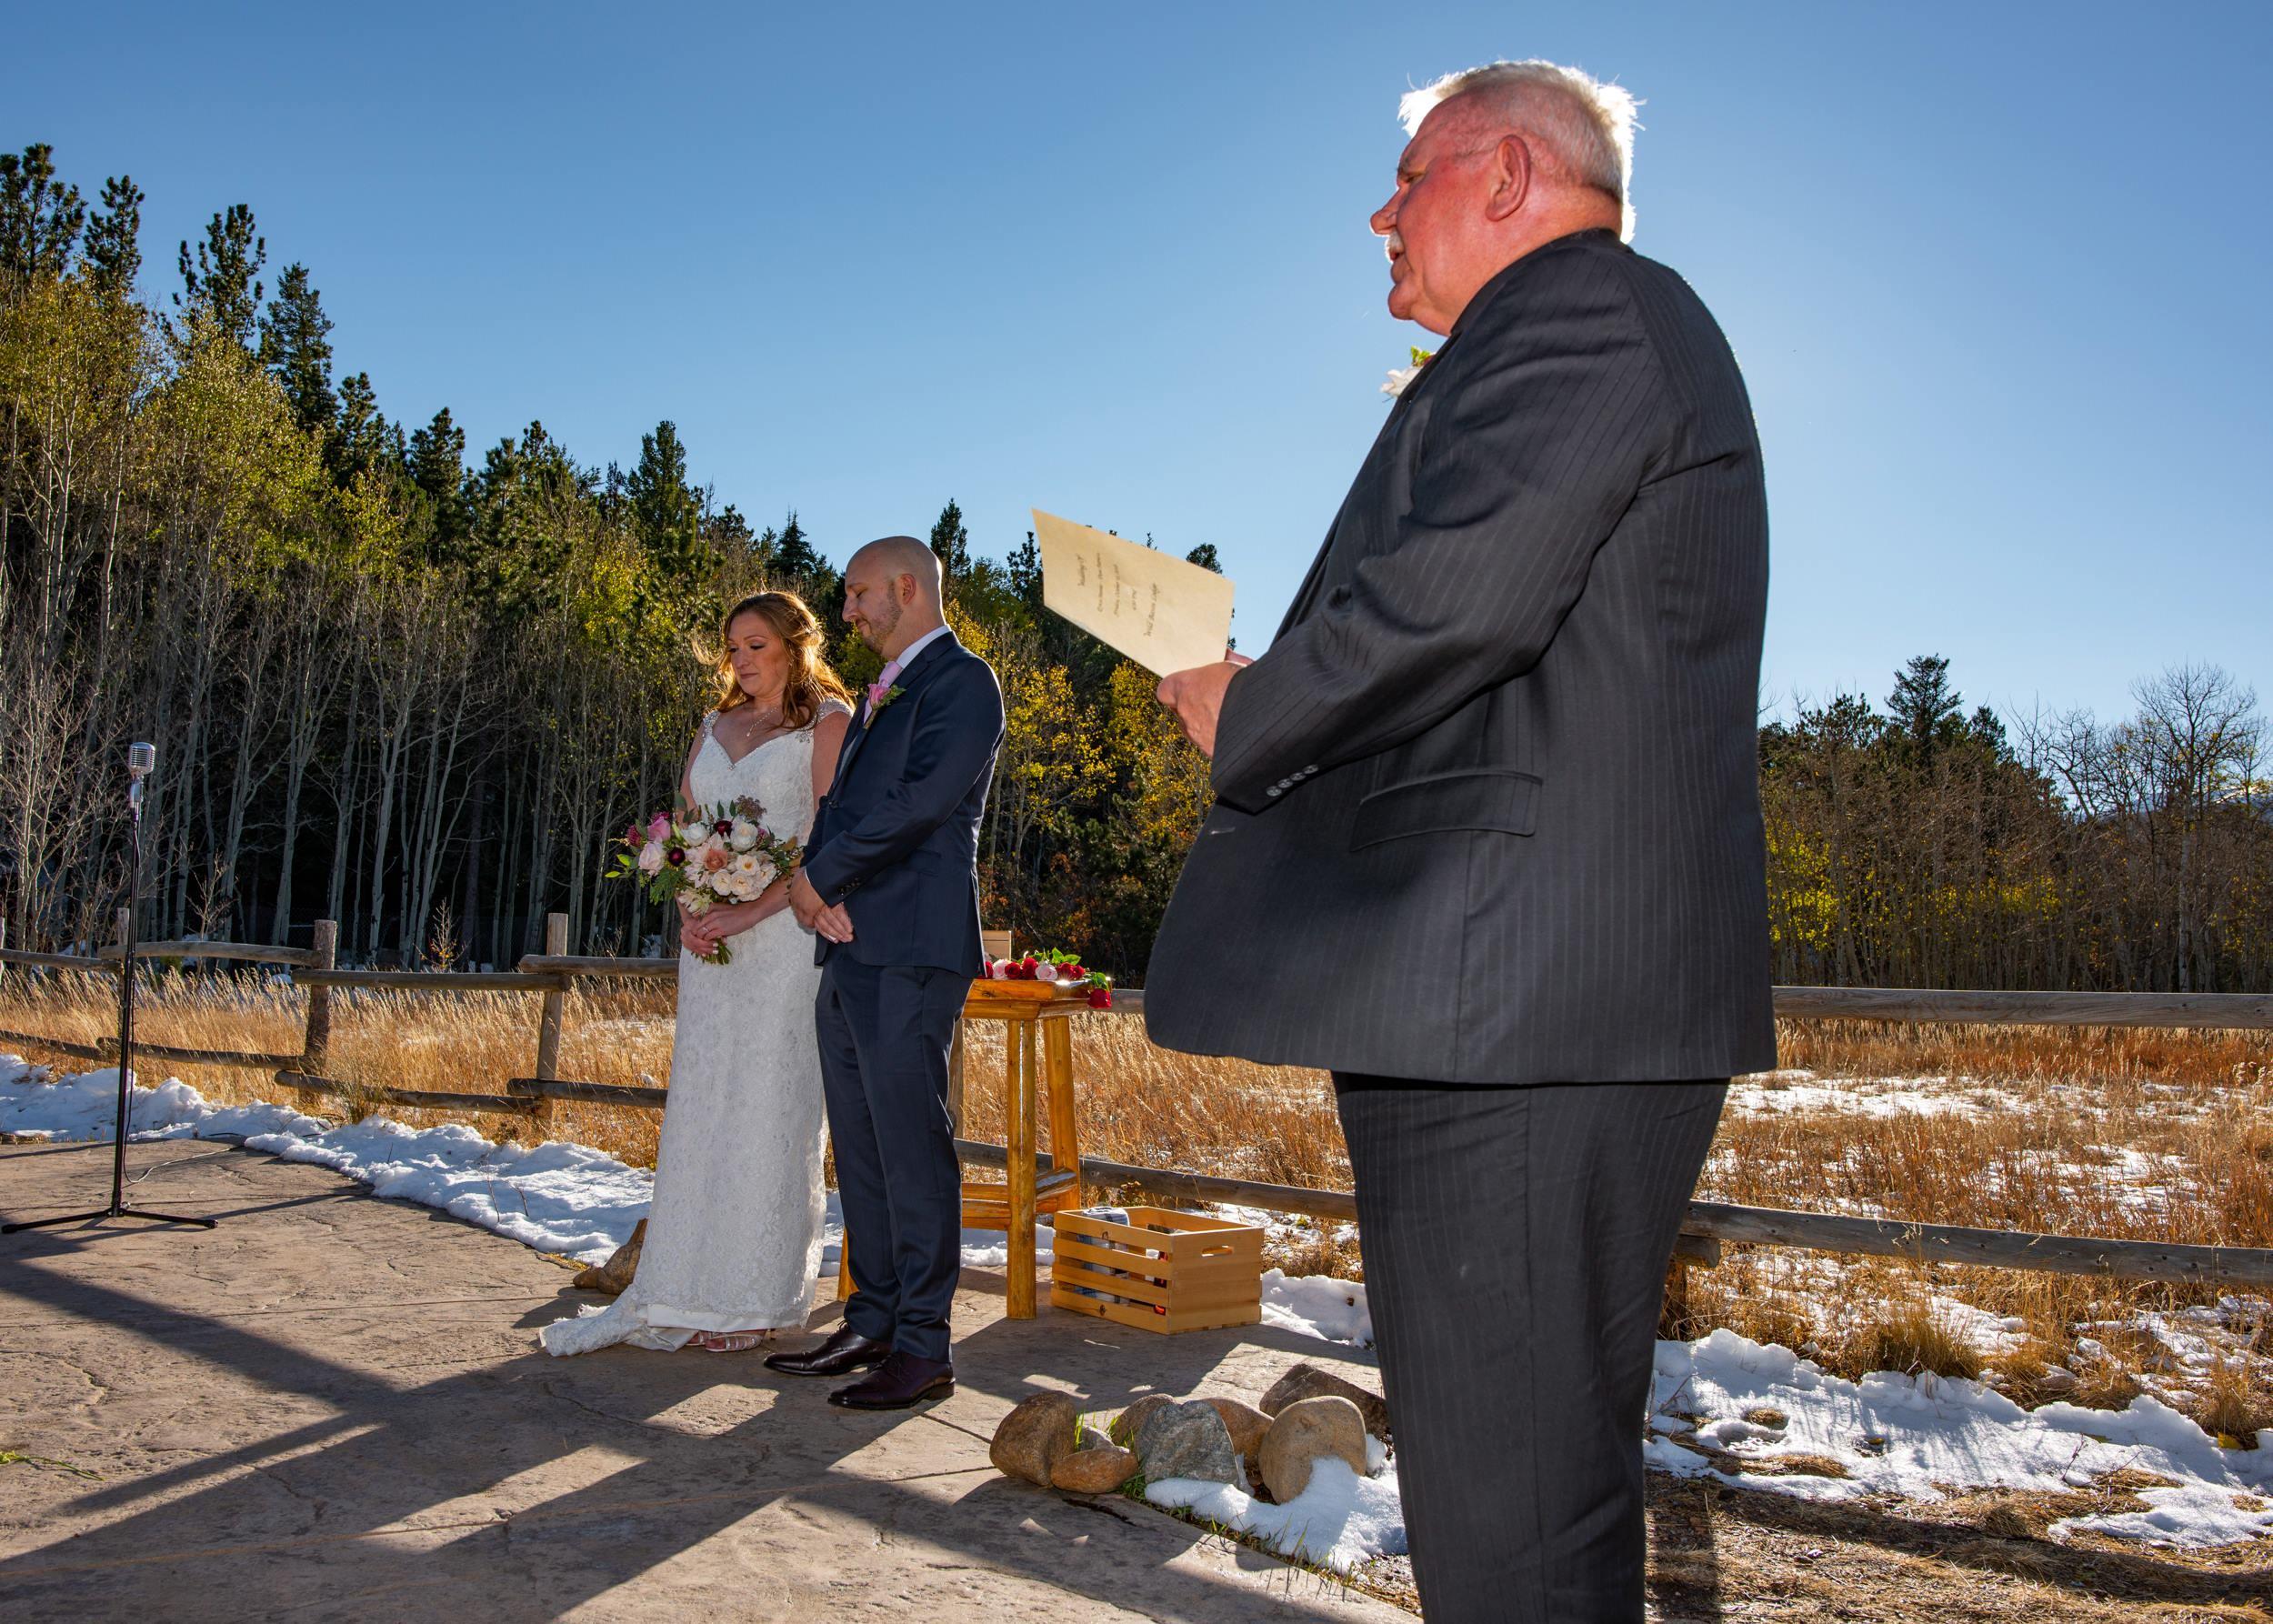 Ceremony-21.JPG